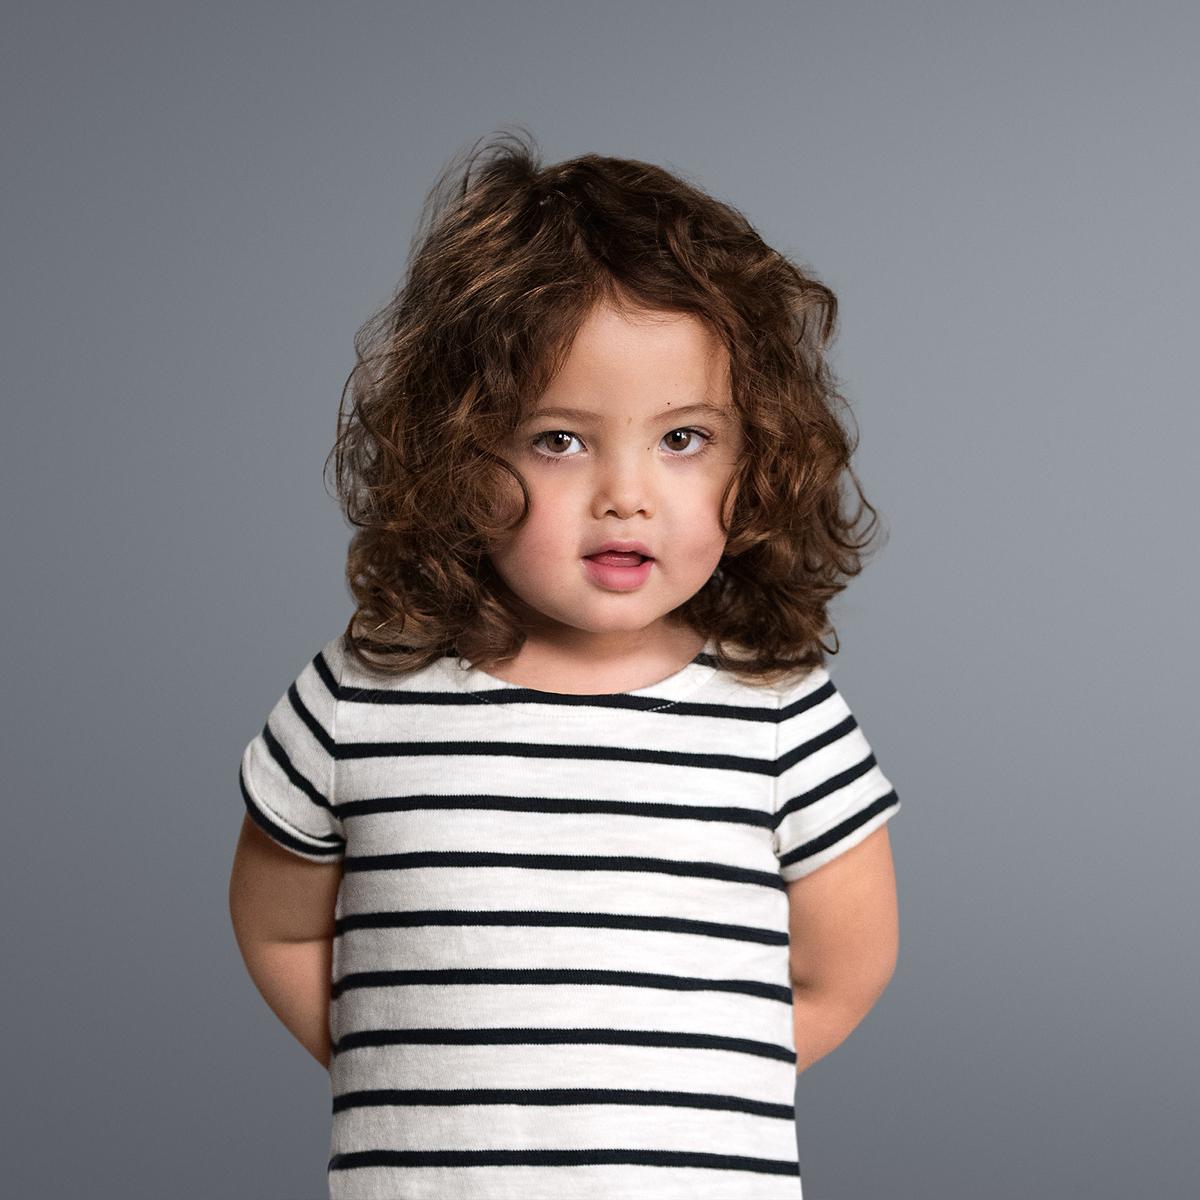 NYP Kids Portraits_0004_Layer Comp 5.jpg